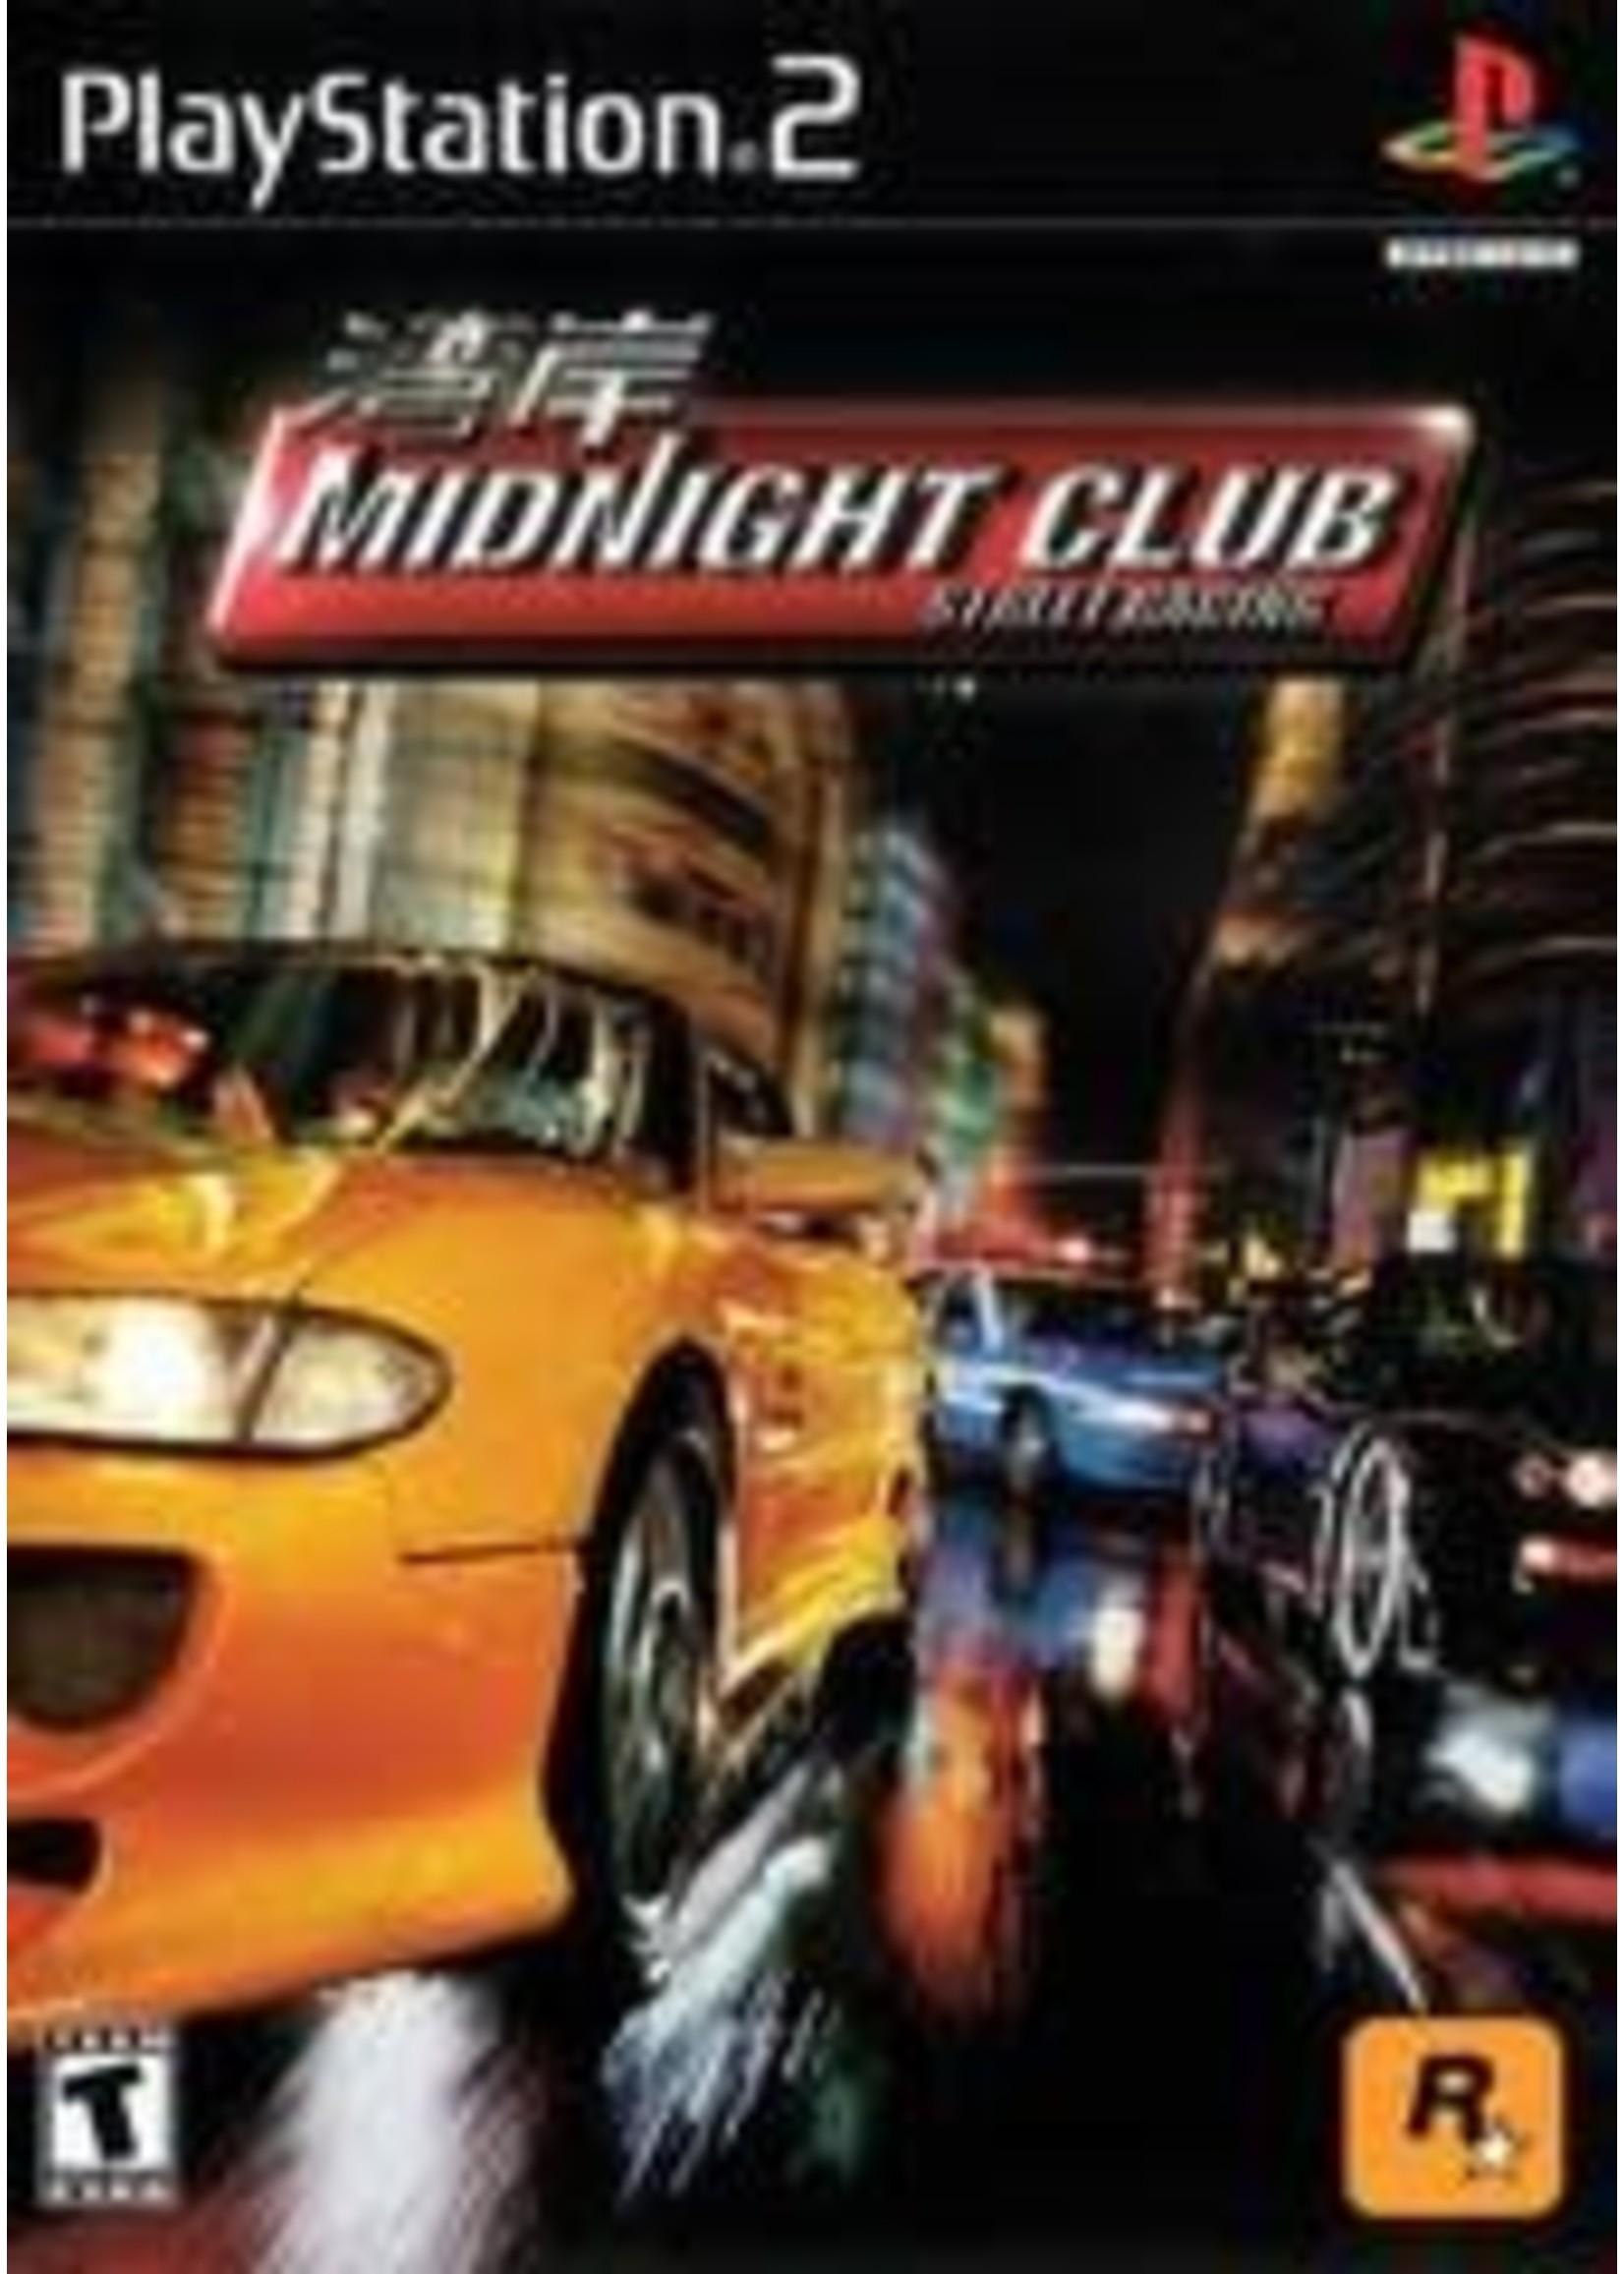 Midnight Club Street Racing Playstation 2